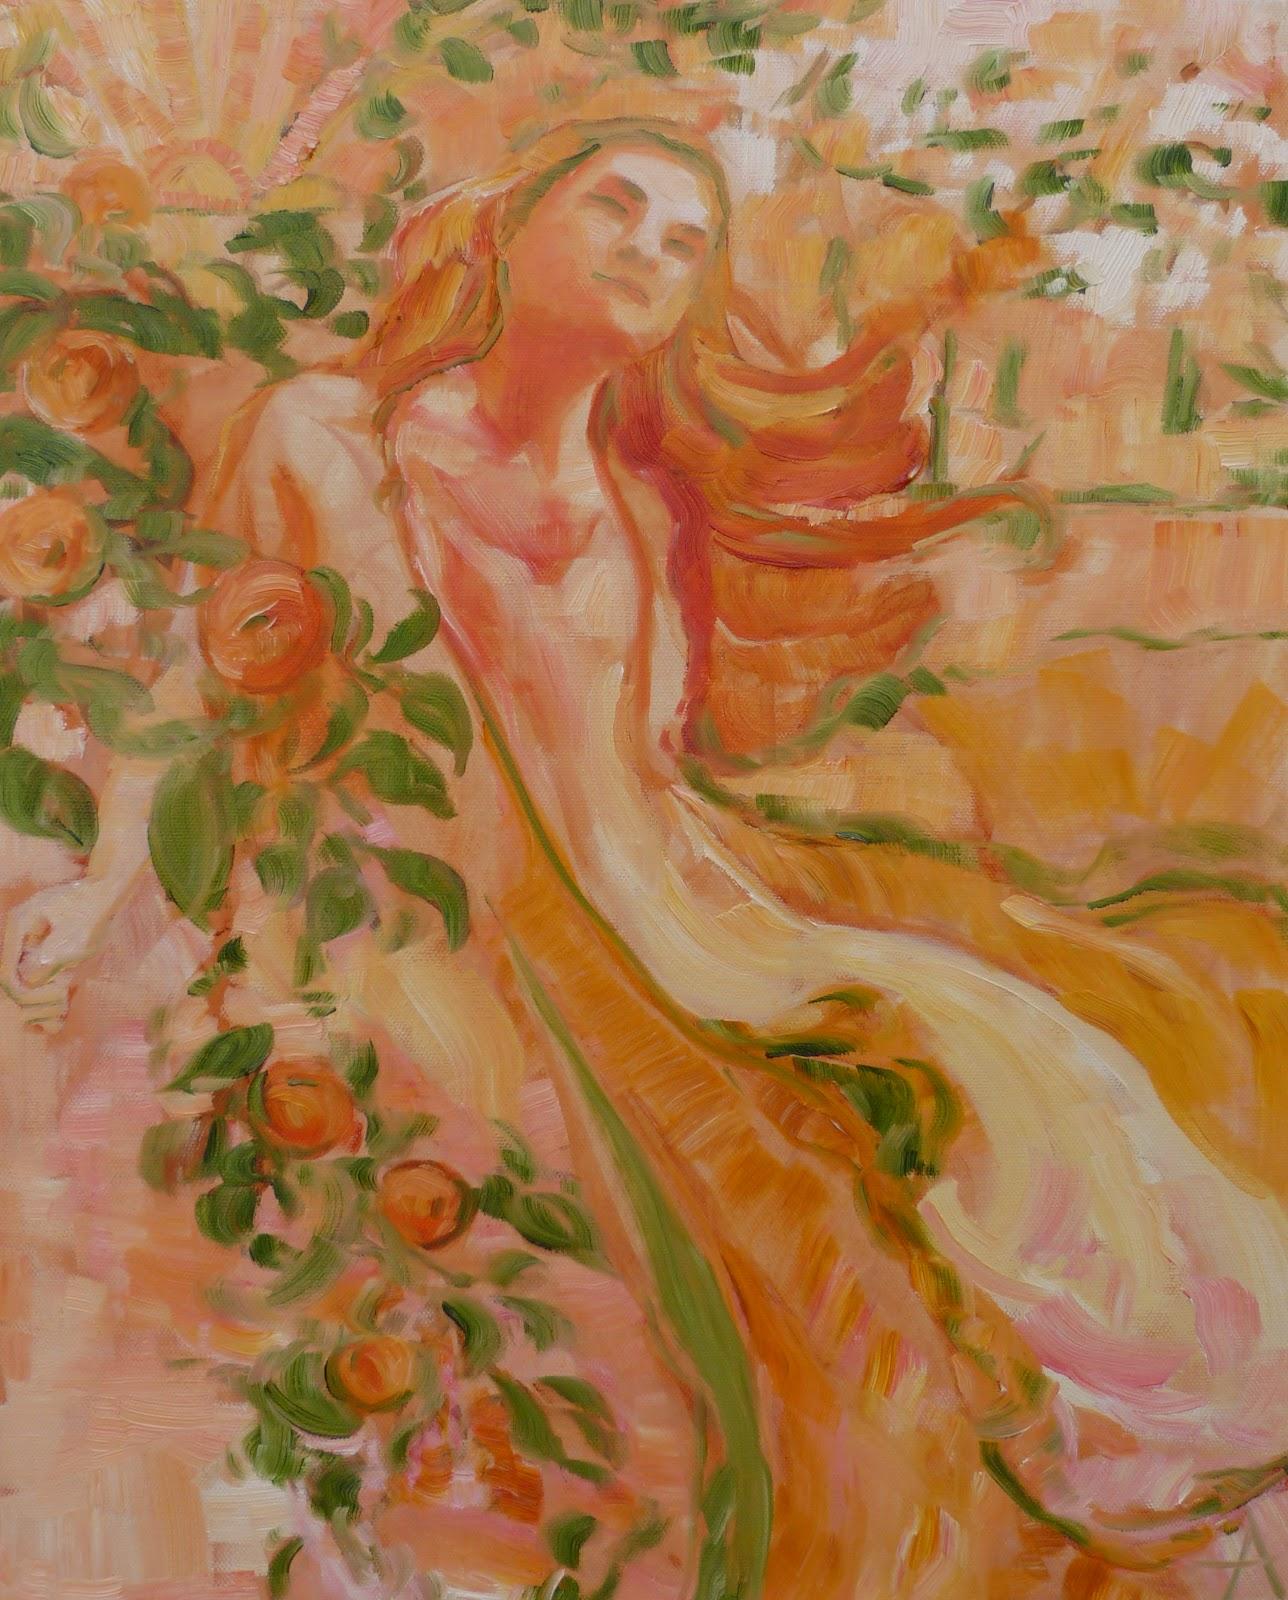 SOLD, A Single Soul, Oil on Canvas, Copyright 2015 Hirschten